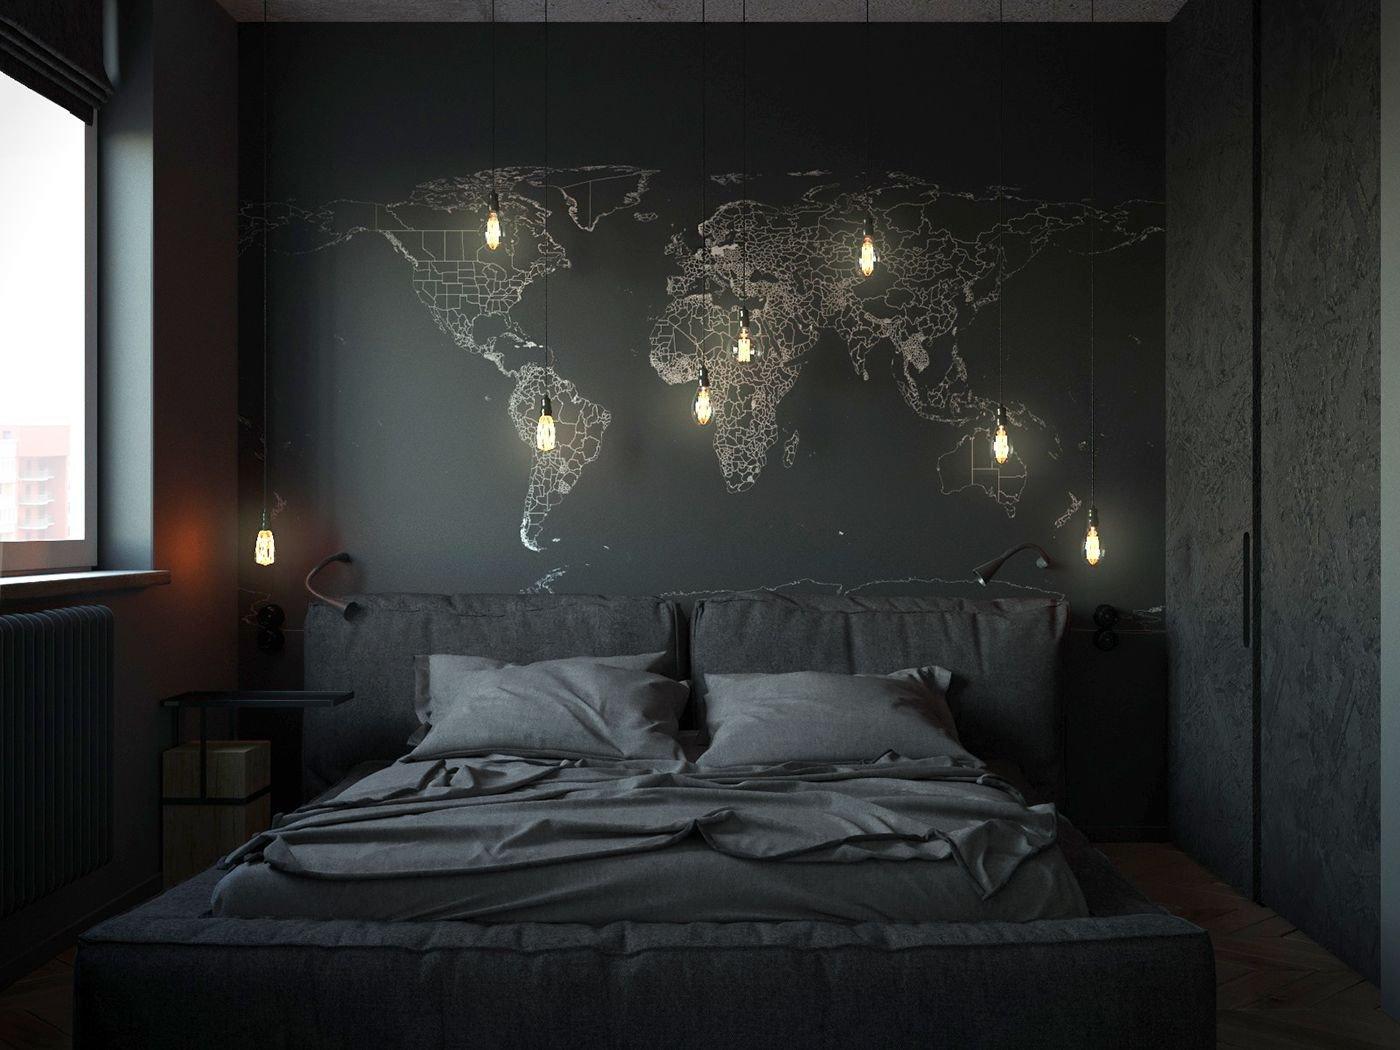 Mens Living Room Wall Decor Inspirational 9 Inspiring Cozy Apartment Decor On Bud Lovely Cozy Apartment Interior